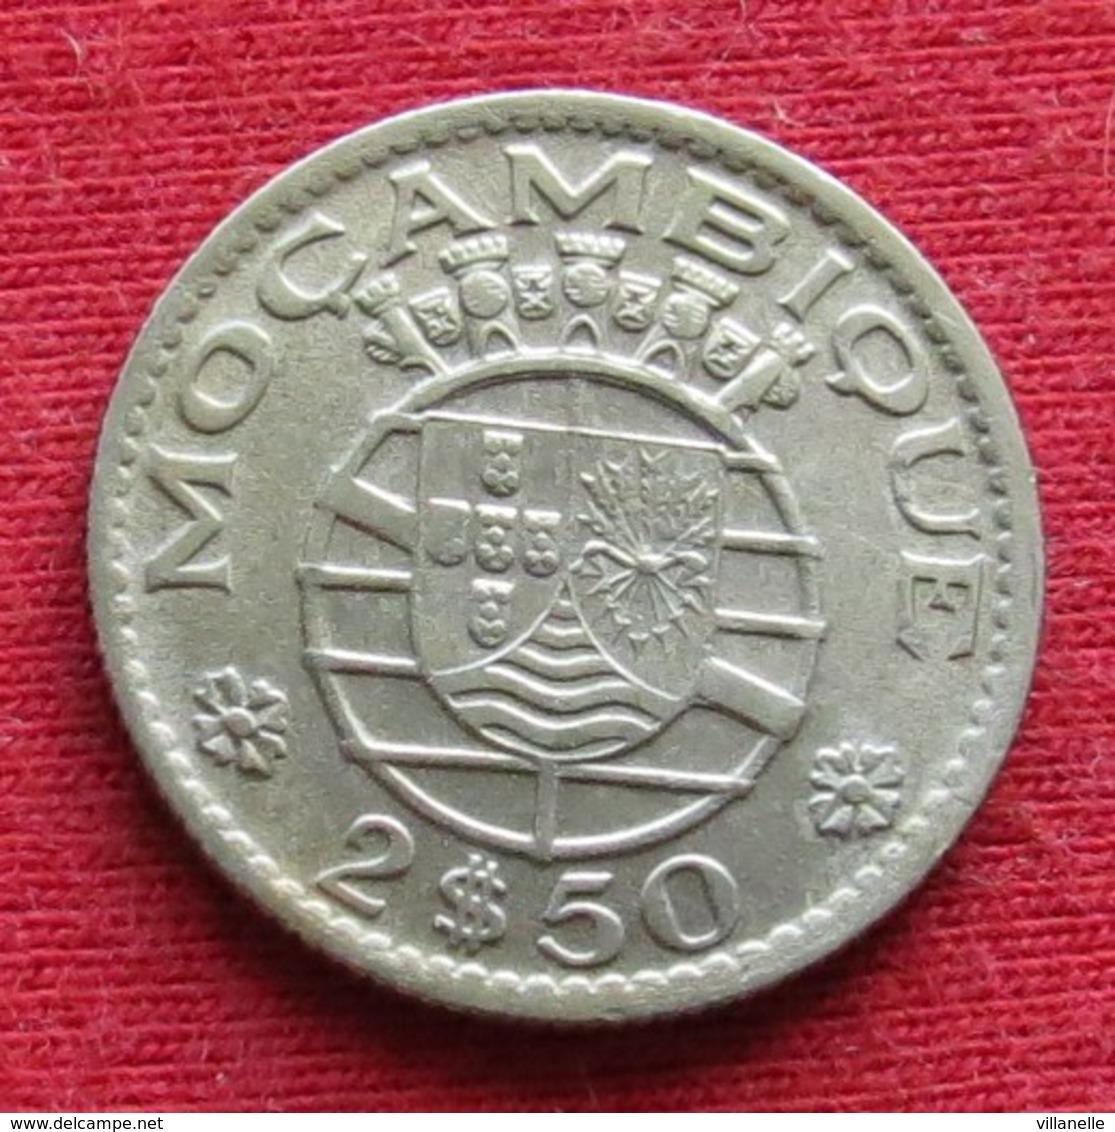 Mozambique 2.50 Escudo 1955 Mozambico Moçambique Wº - Mozambique